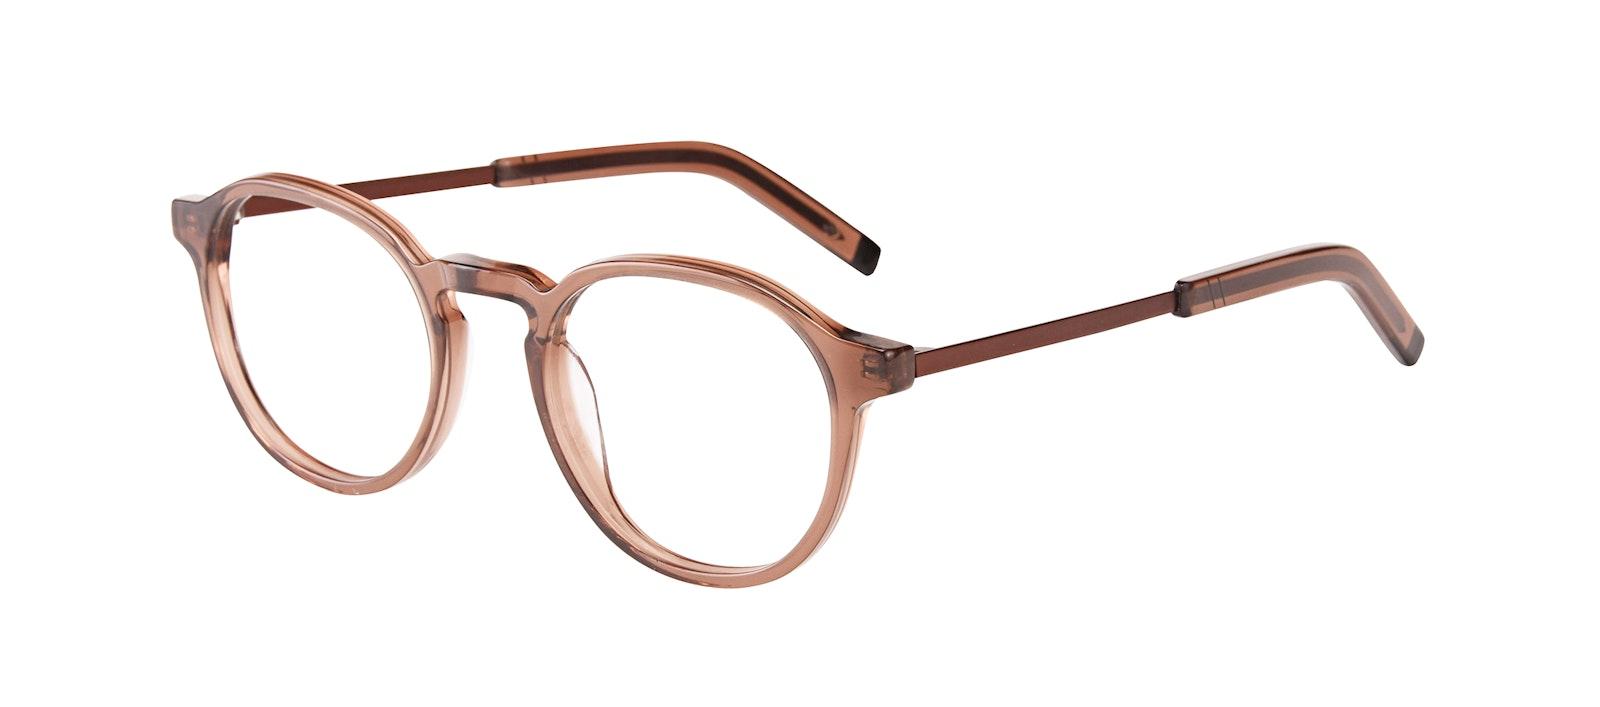 Affordable Fashion Glasses Round Eyeglasses Men Prime XL Terra Tilt